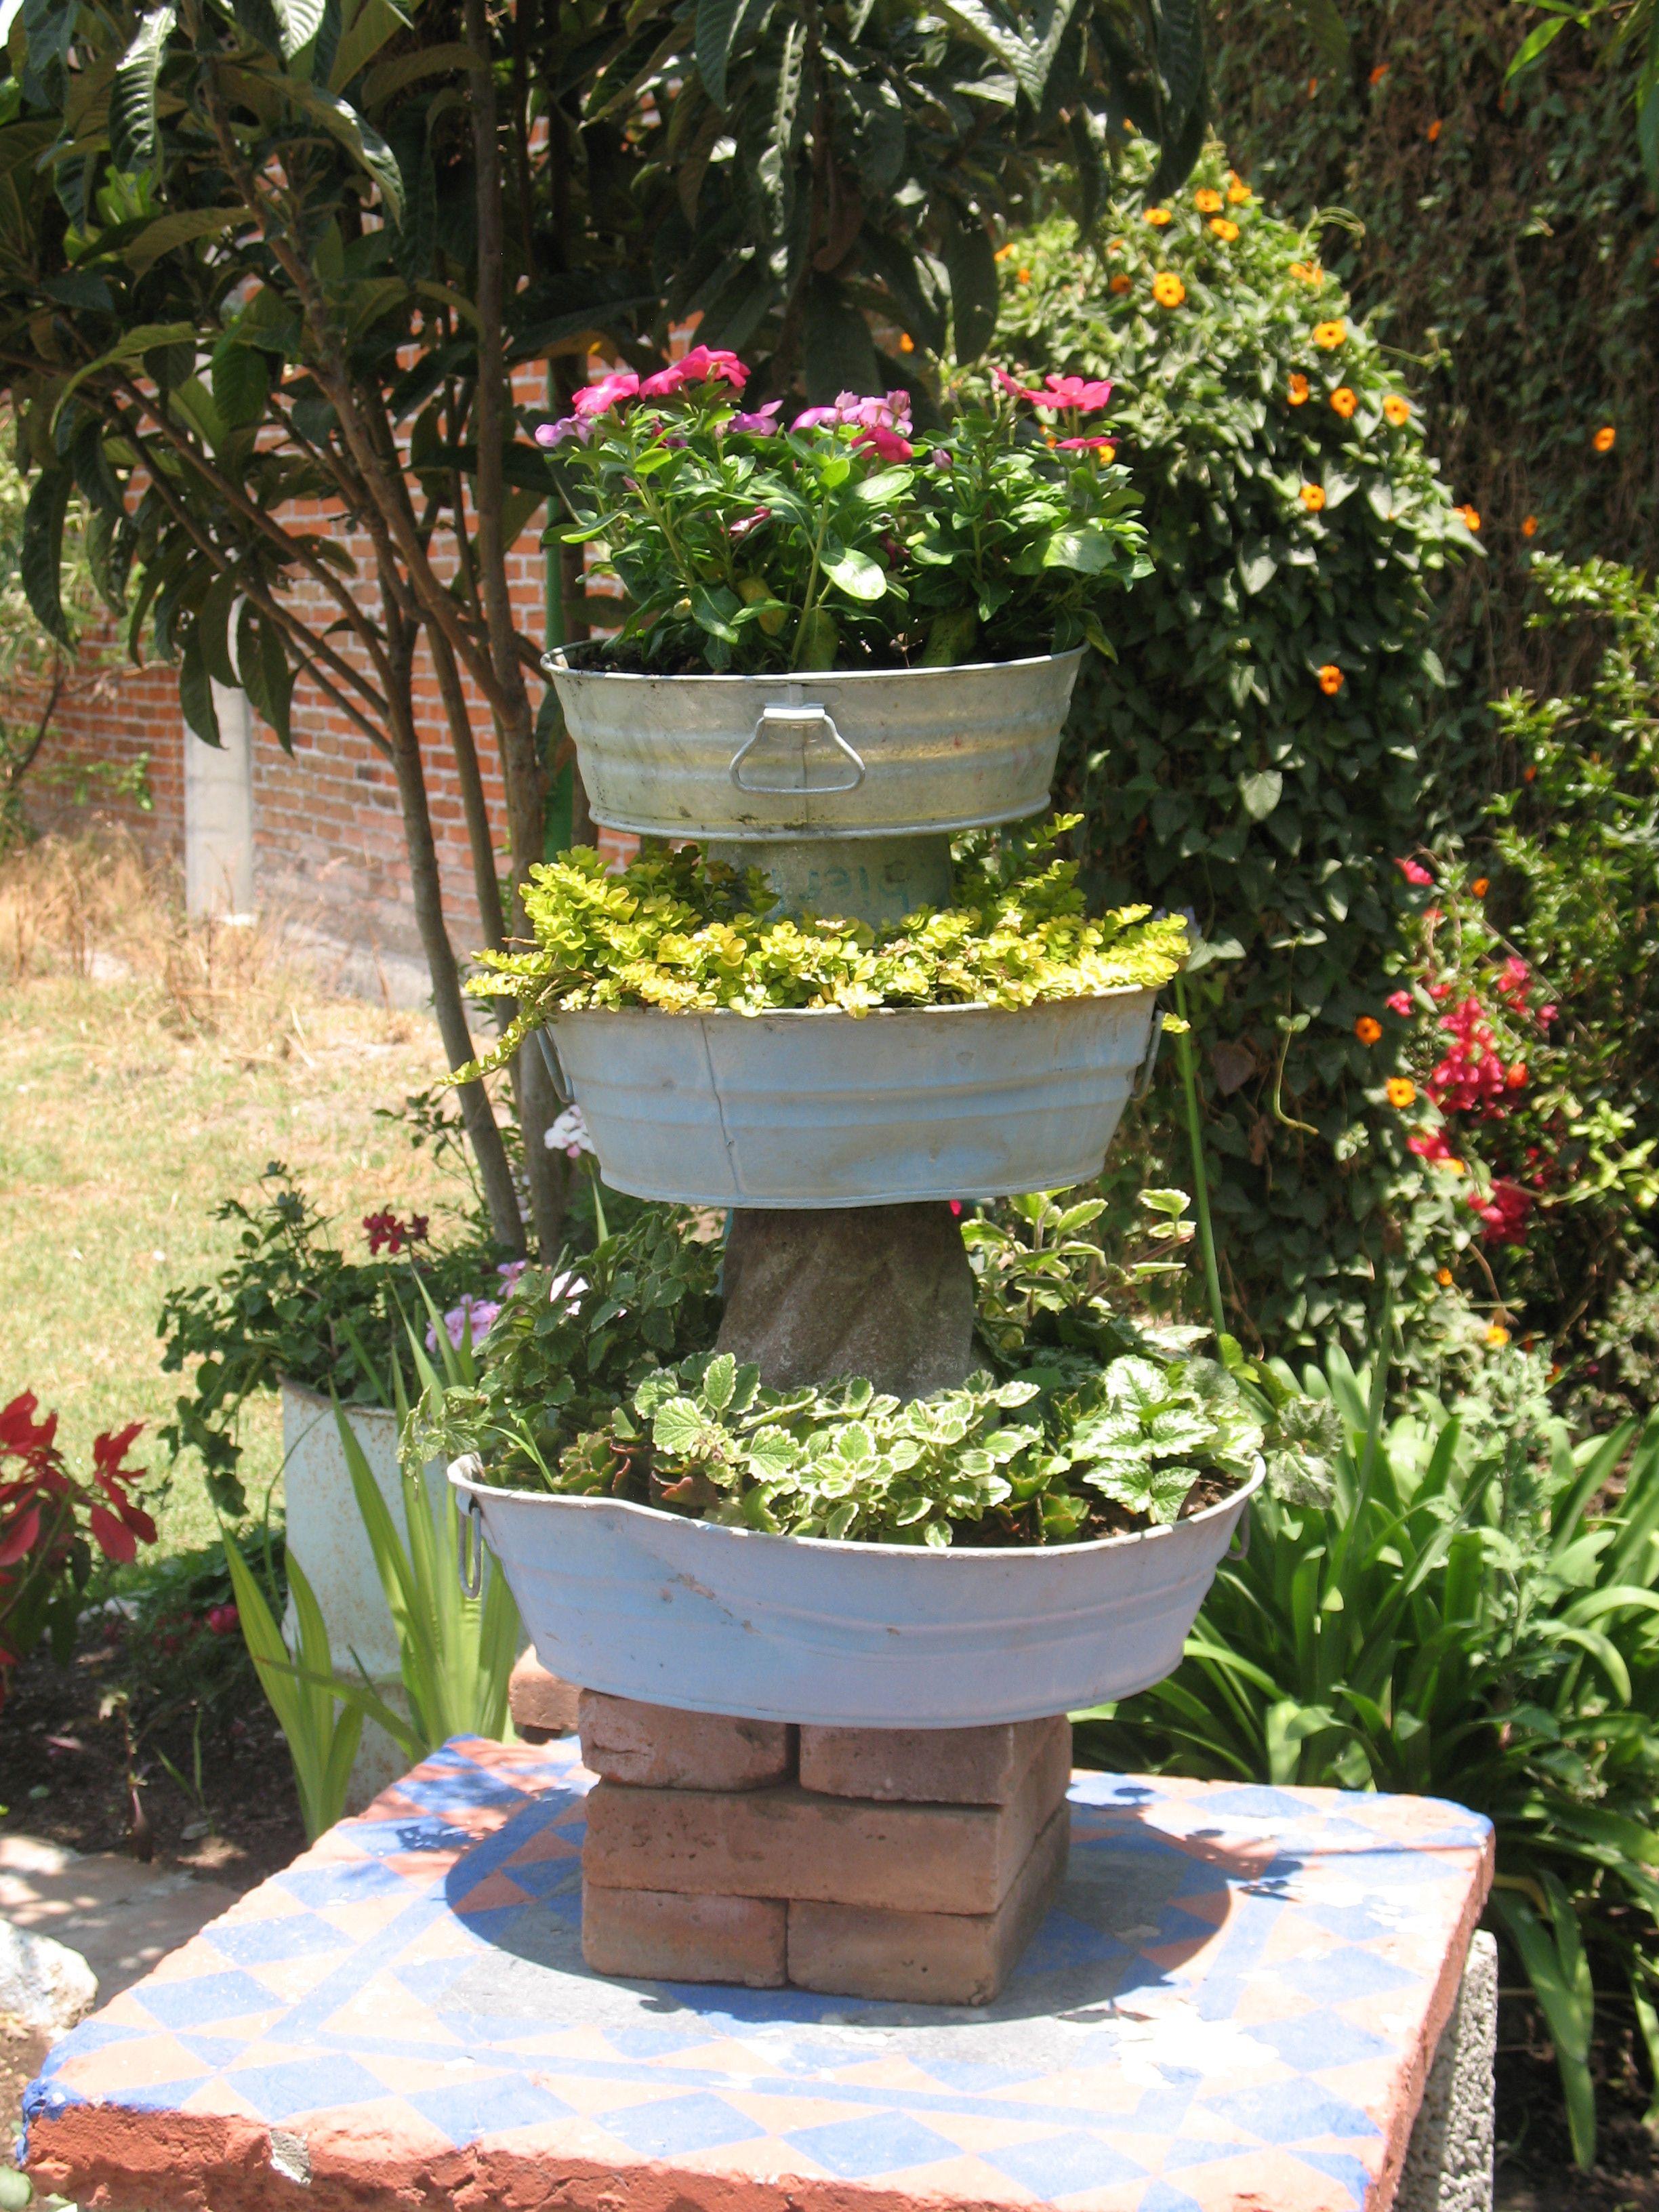 Recycling life garden ideas pinterest for Recycled garden ideas pinterest